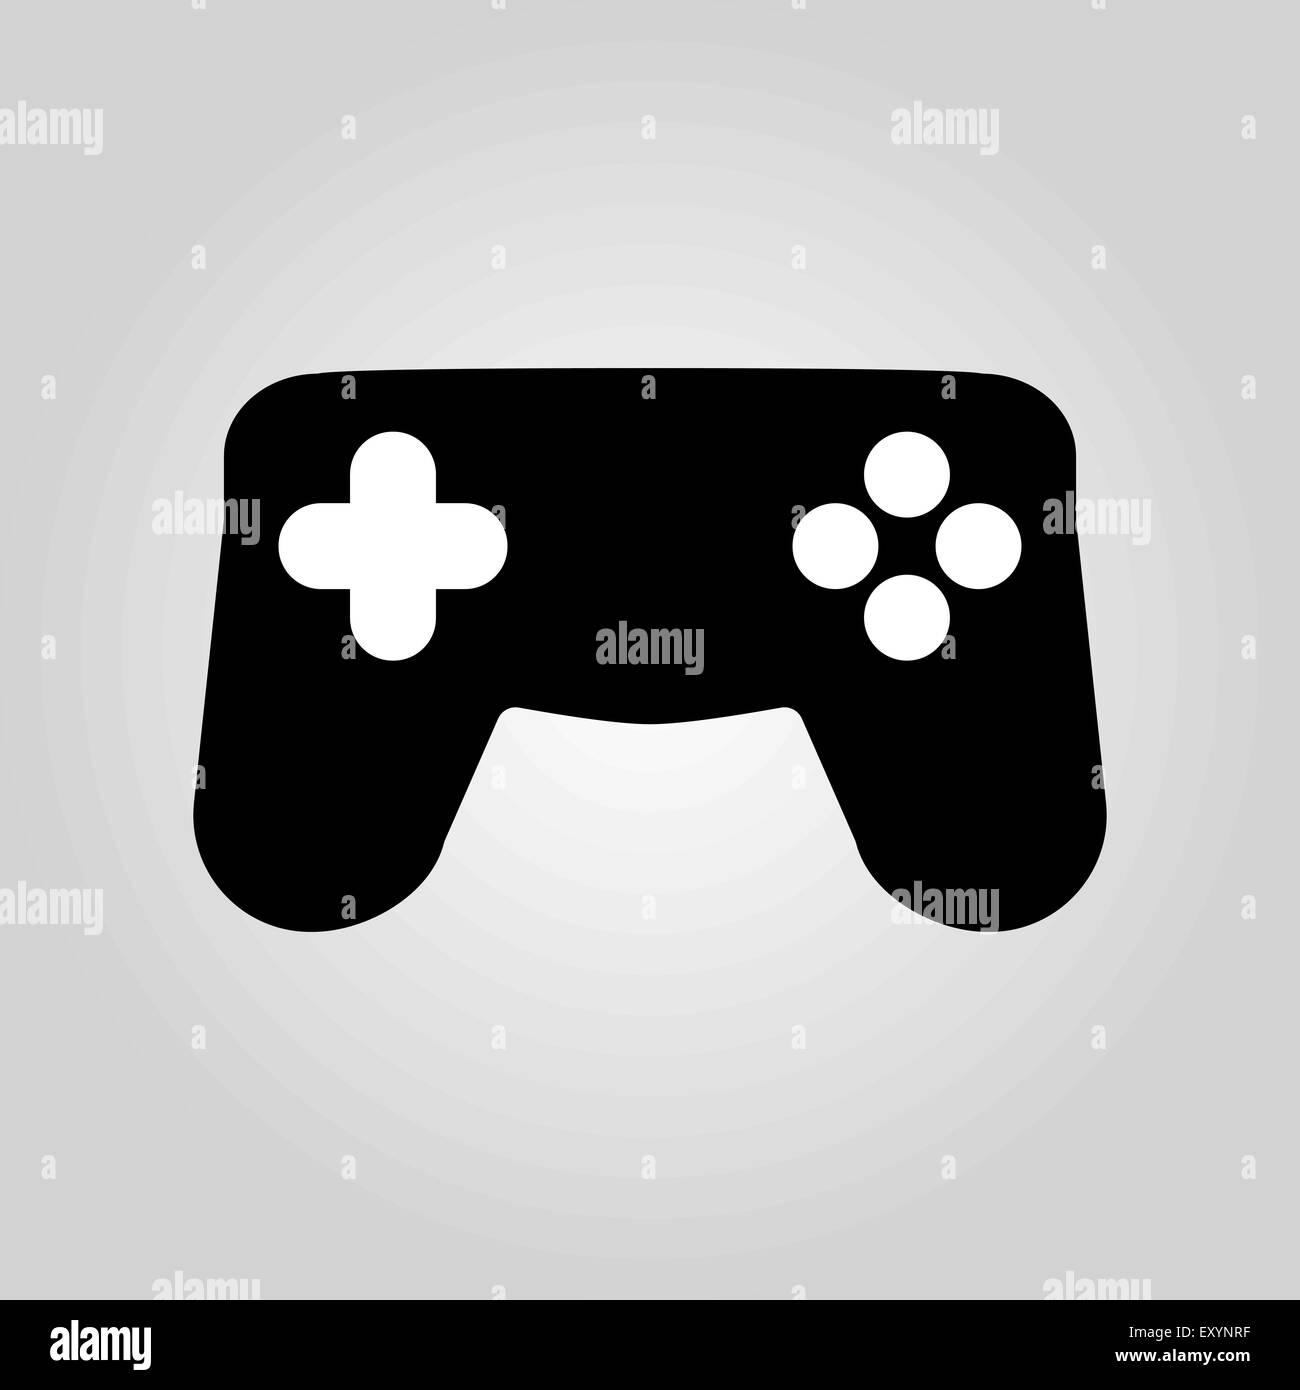 The gamepad icon game symbol flat stock vector art game symbol flat buycottarizona